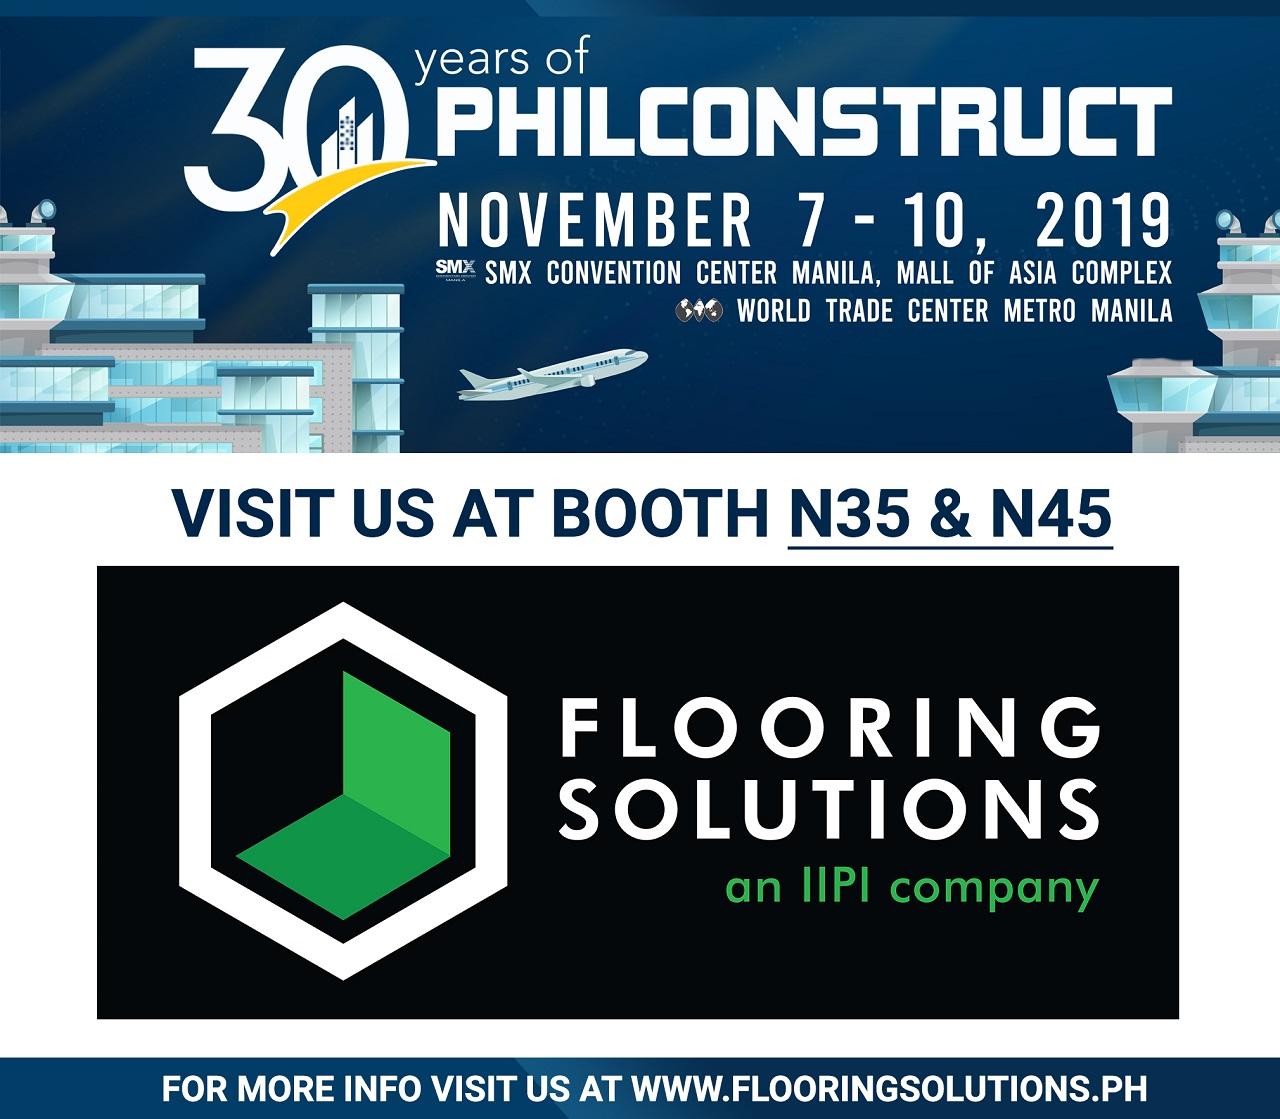 Flooring Solutions Philippines in the 30th PHILCONSTRUCT Manila 2019